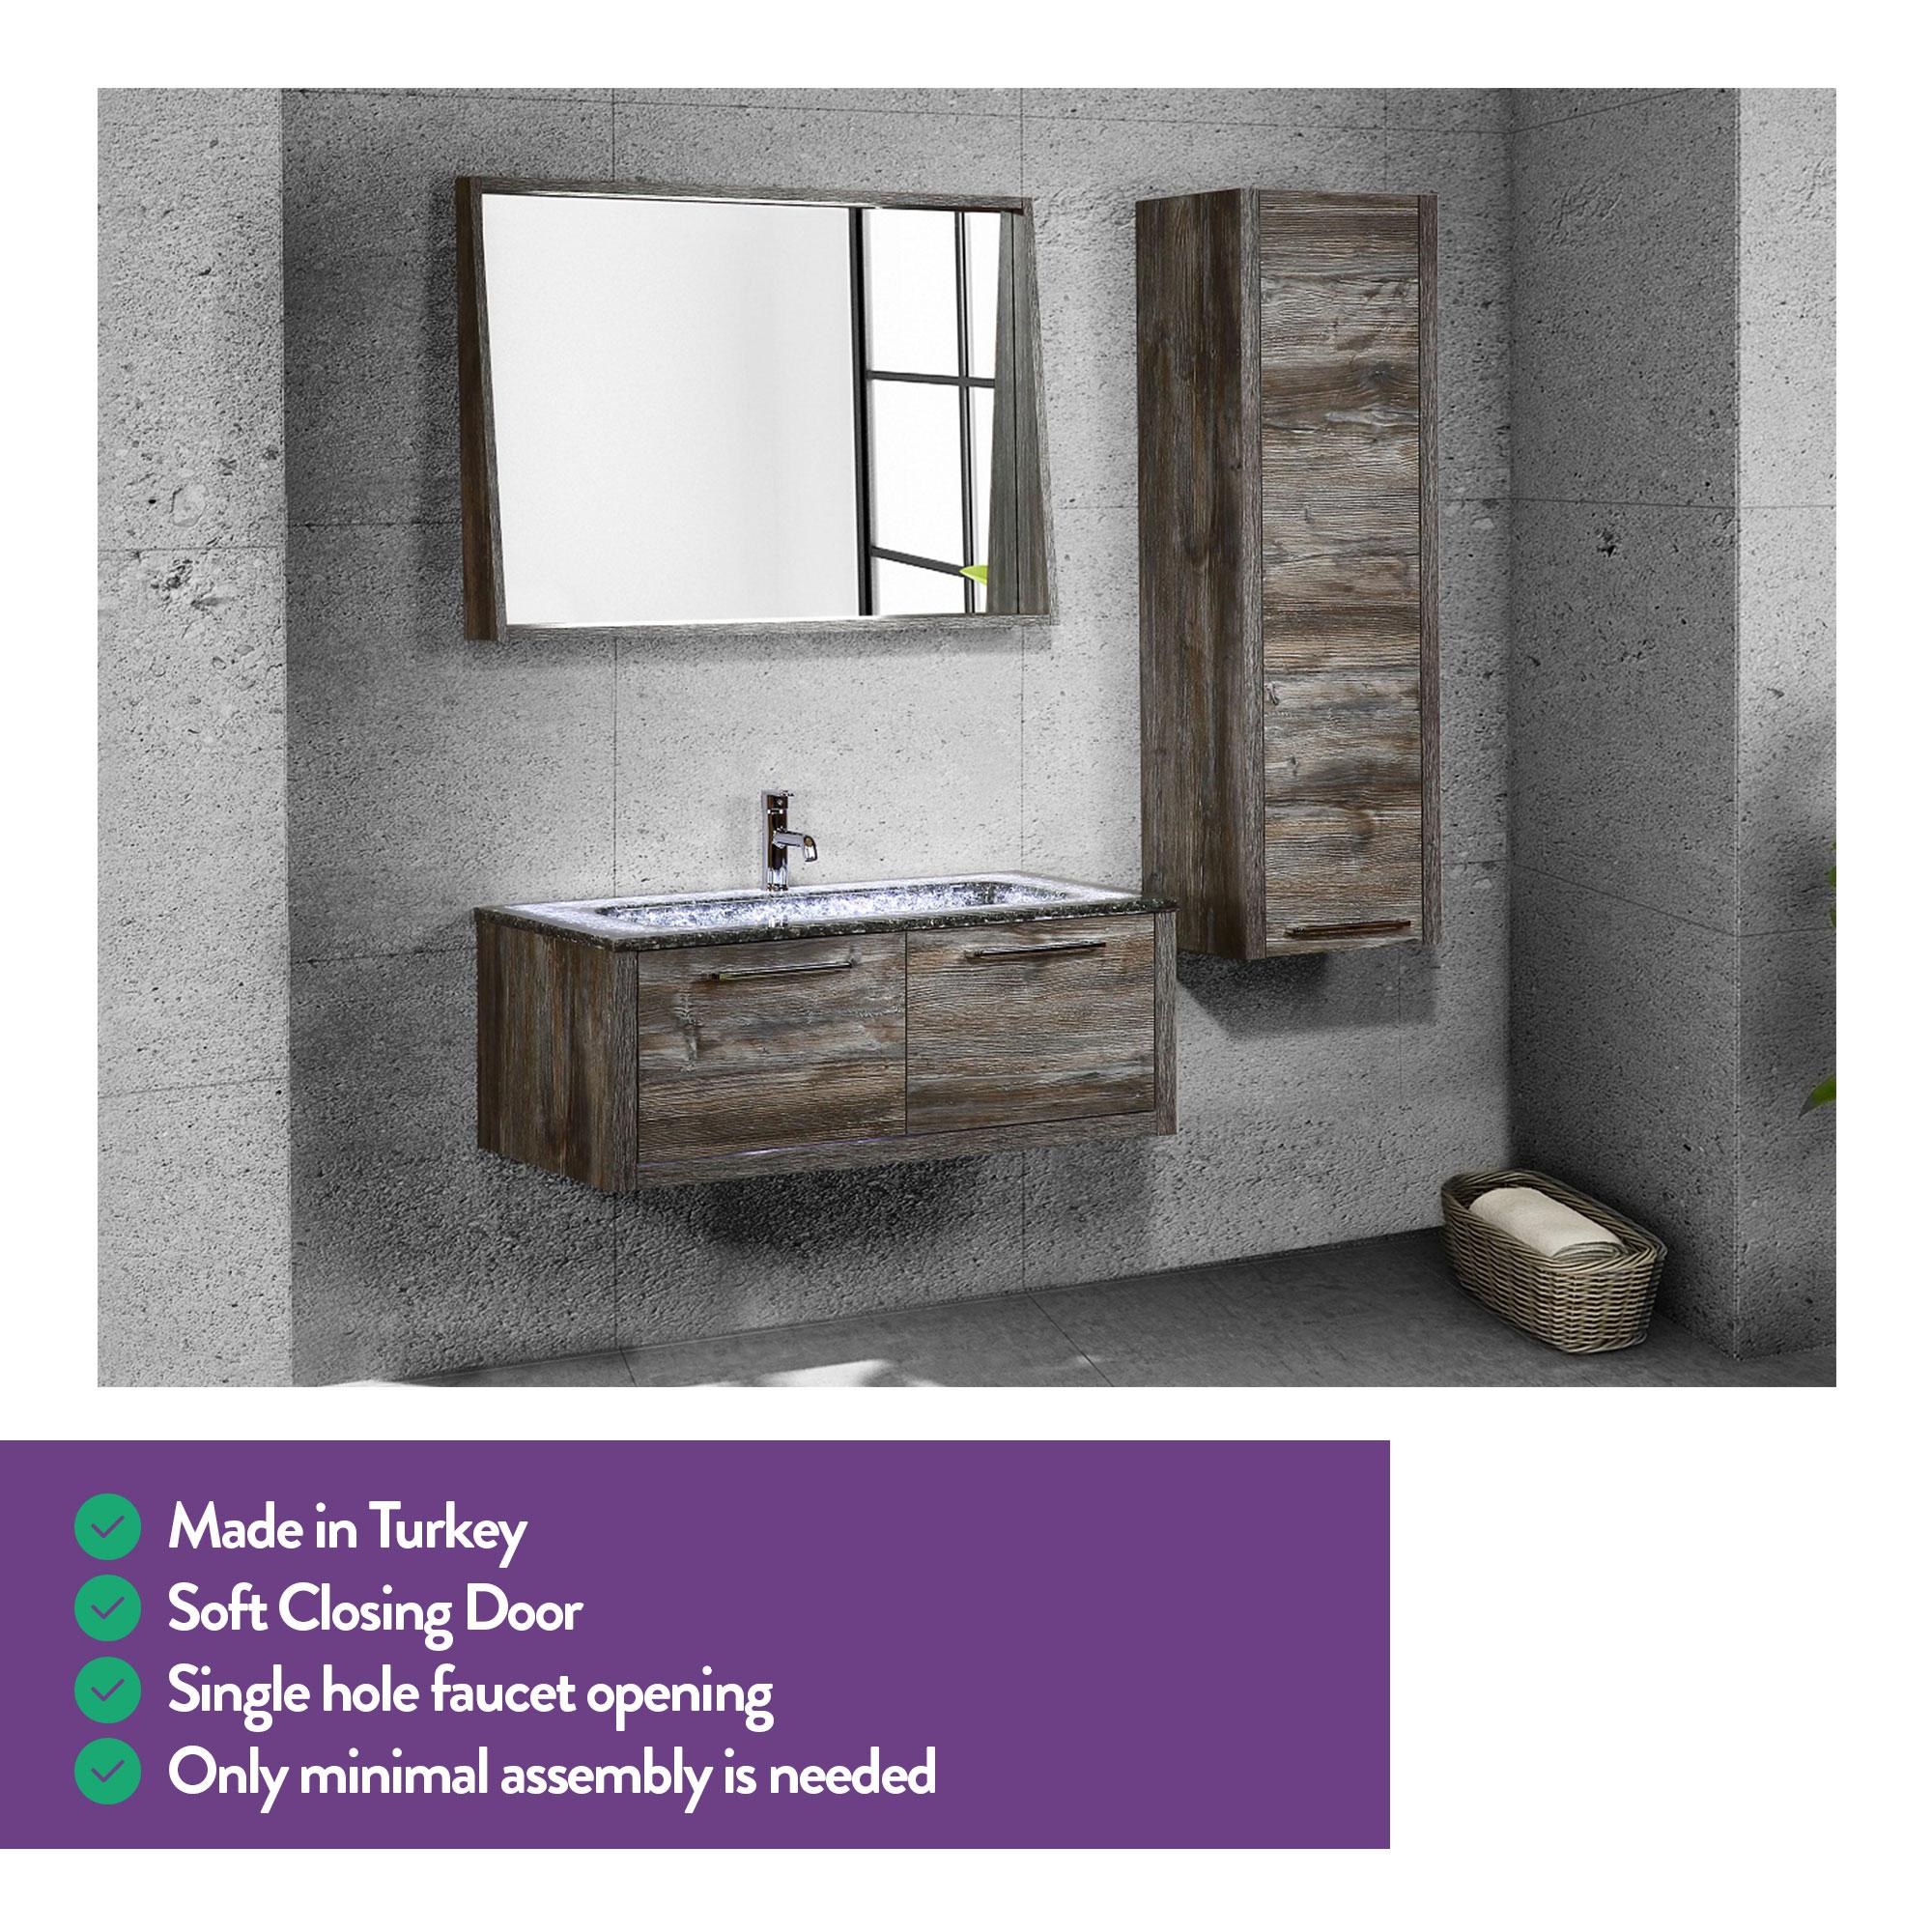 Casa Mare Matto 32 Jackson Pine Grey Oak Wood Stonyx Design Bathroom Vanity With Dolamite Crystalline Stone Single Sink And Wood Frame Mirror Home Designer Goods